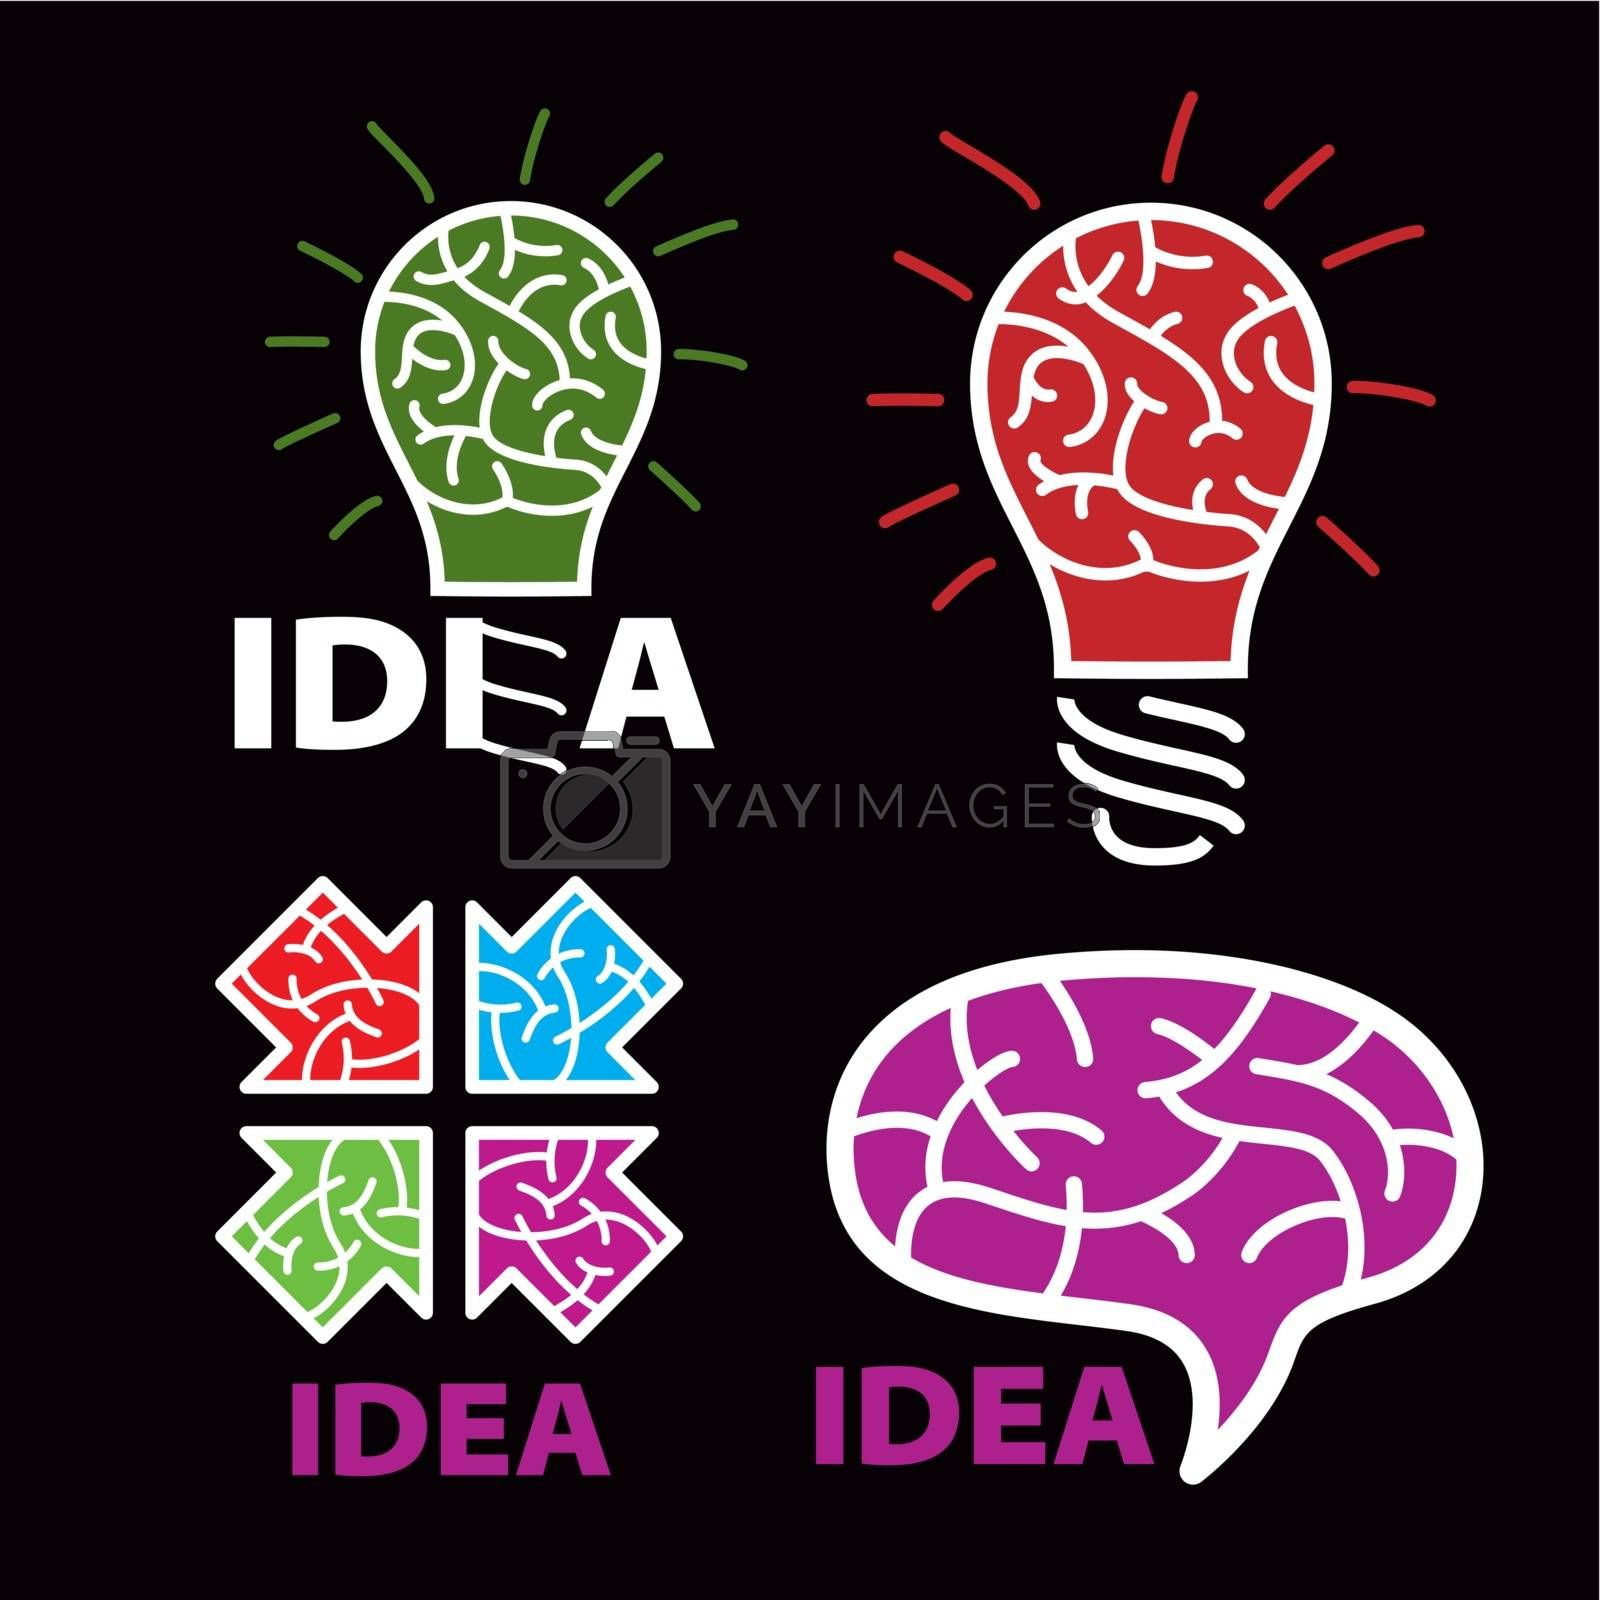 logo idea. brain on a black background